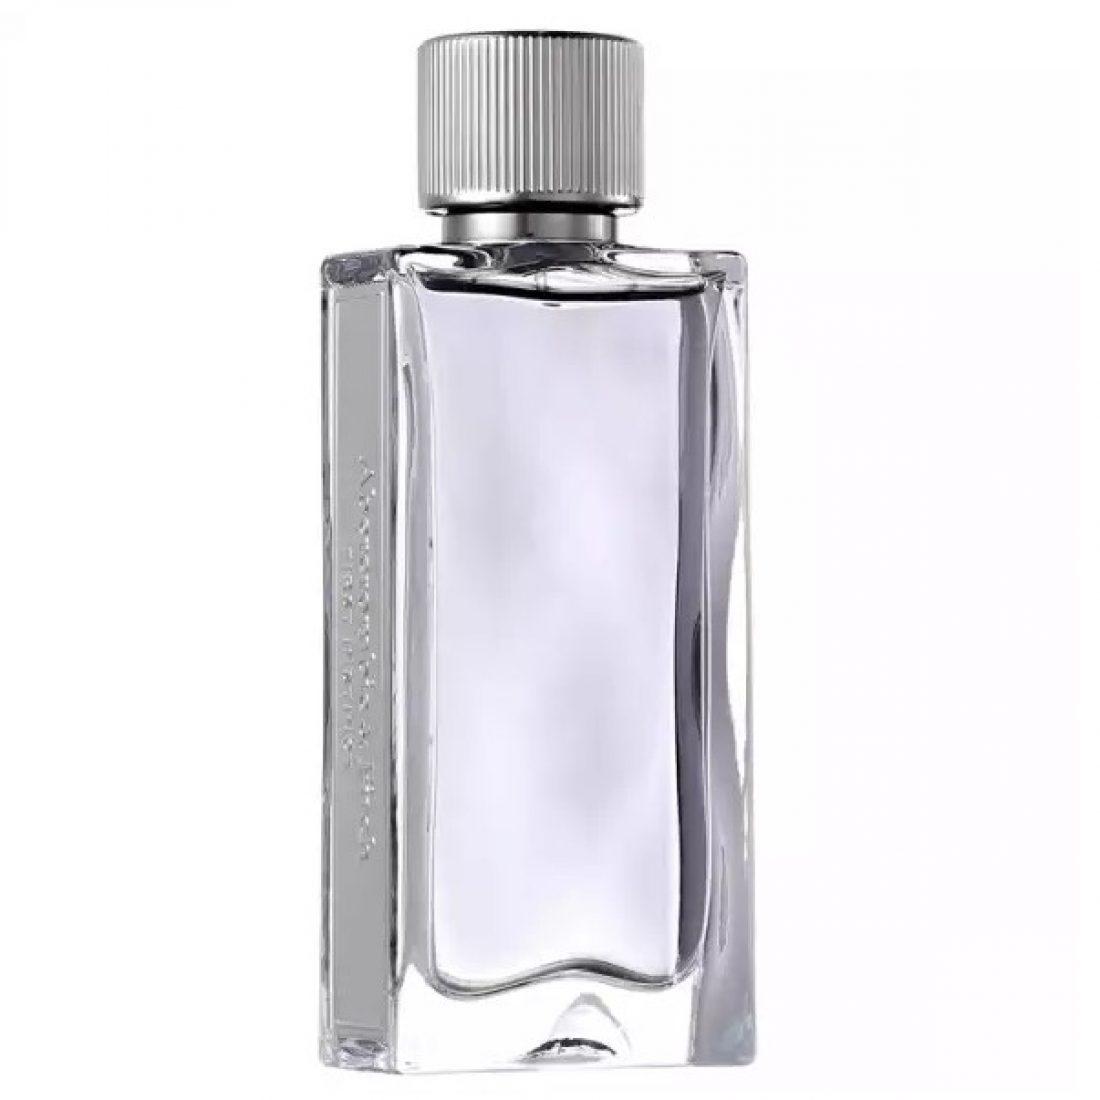 Abercrombie & Fitch – First Instinct – 100 ml – Edt_Parfume.dk